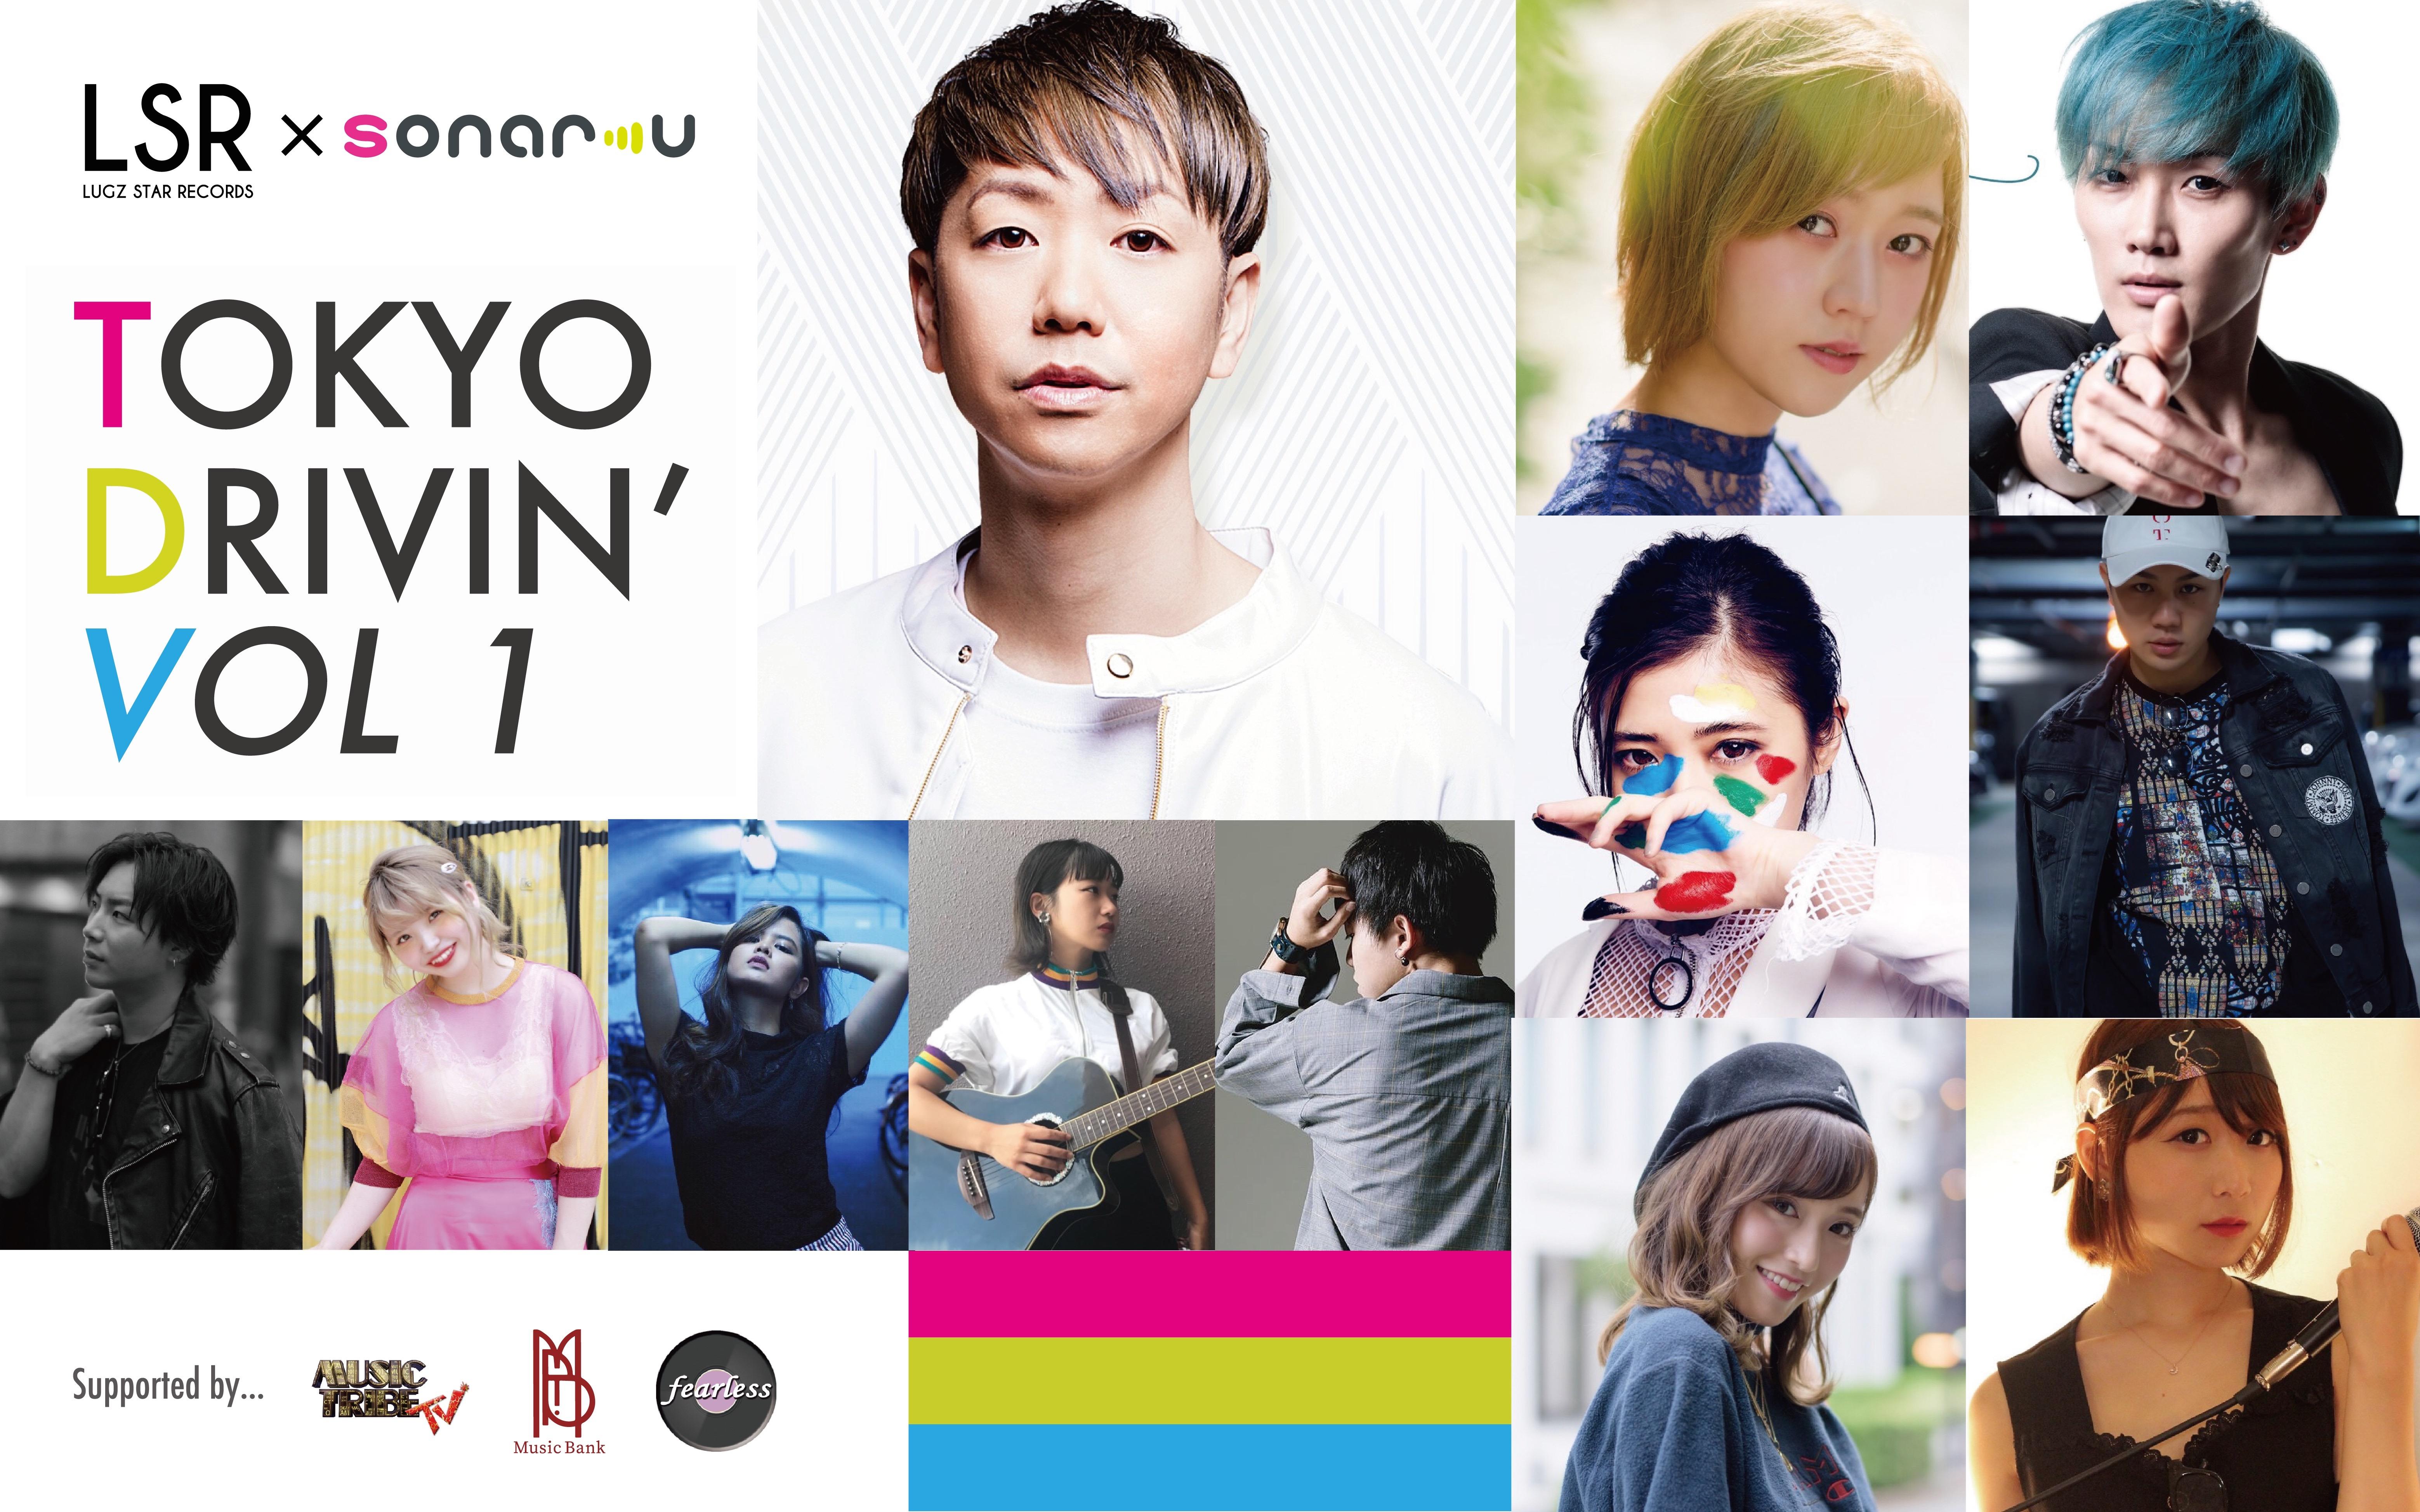 "LUGZ STAR RECORDS × sonar-u ""TOKYO DRIVIN' VOL.1"